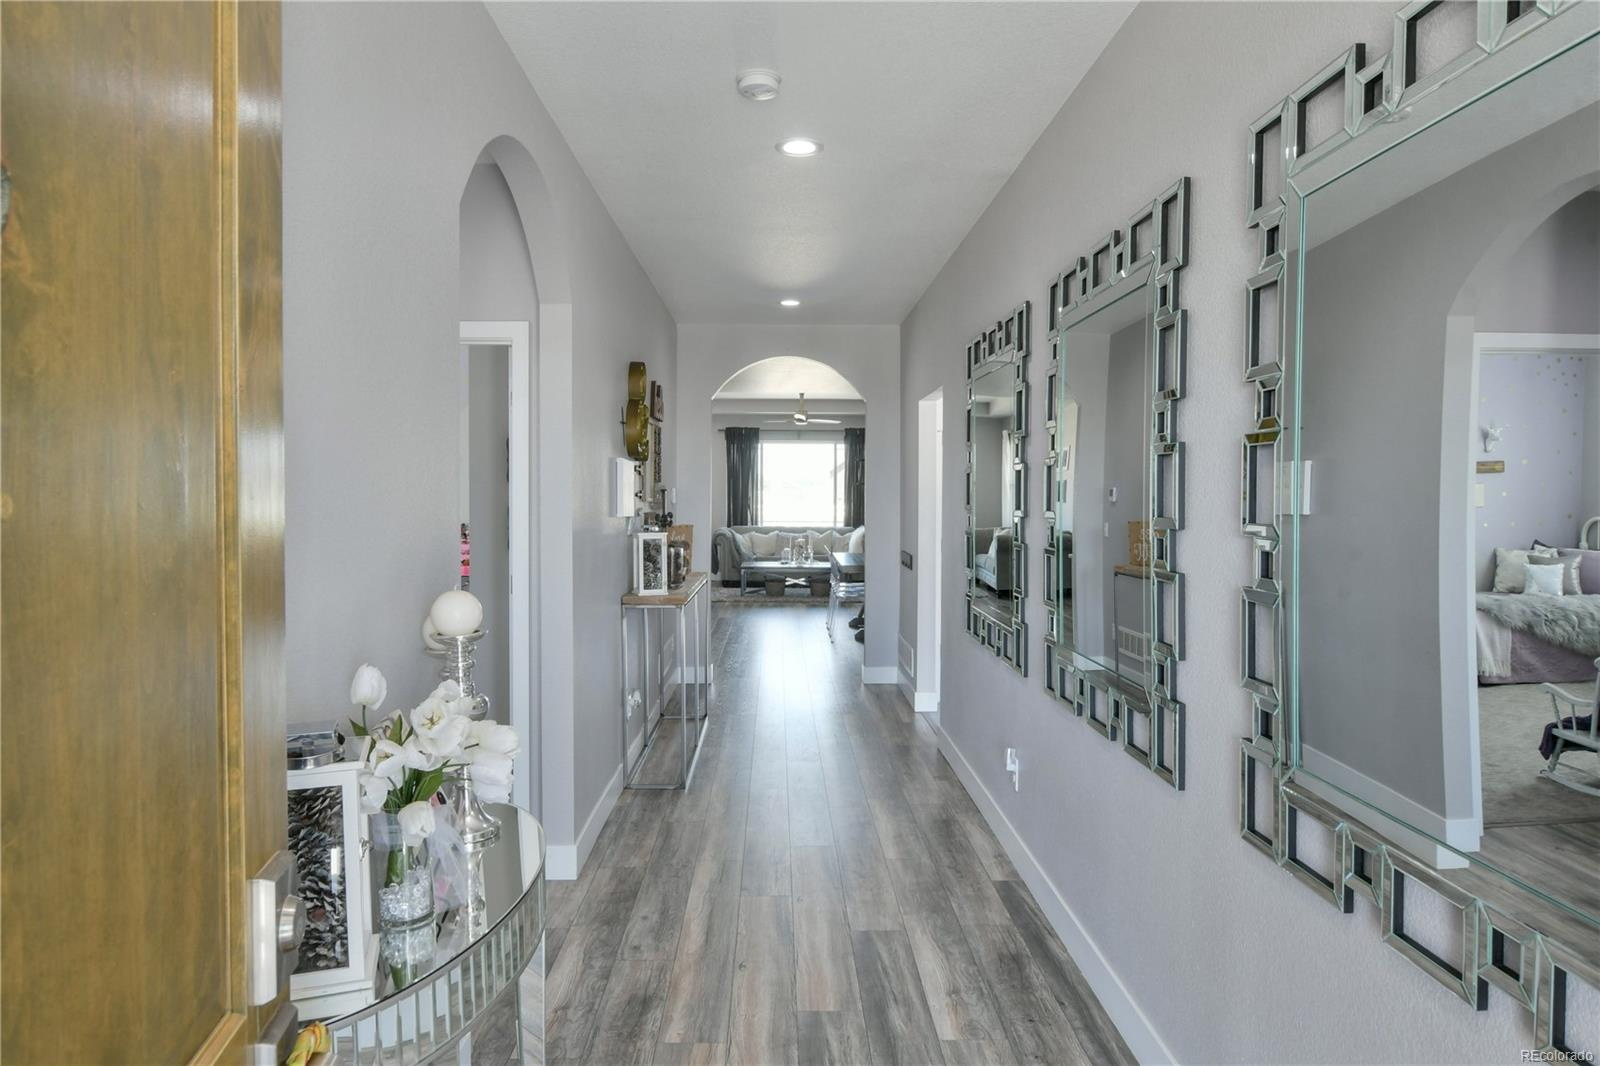 Gorgeous waterproof laminate plank flooring throughout entire living area, lifetime warranty